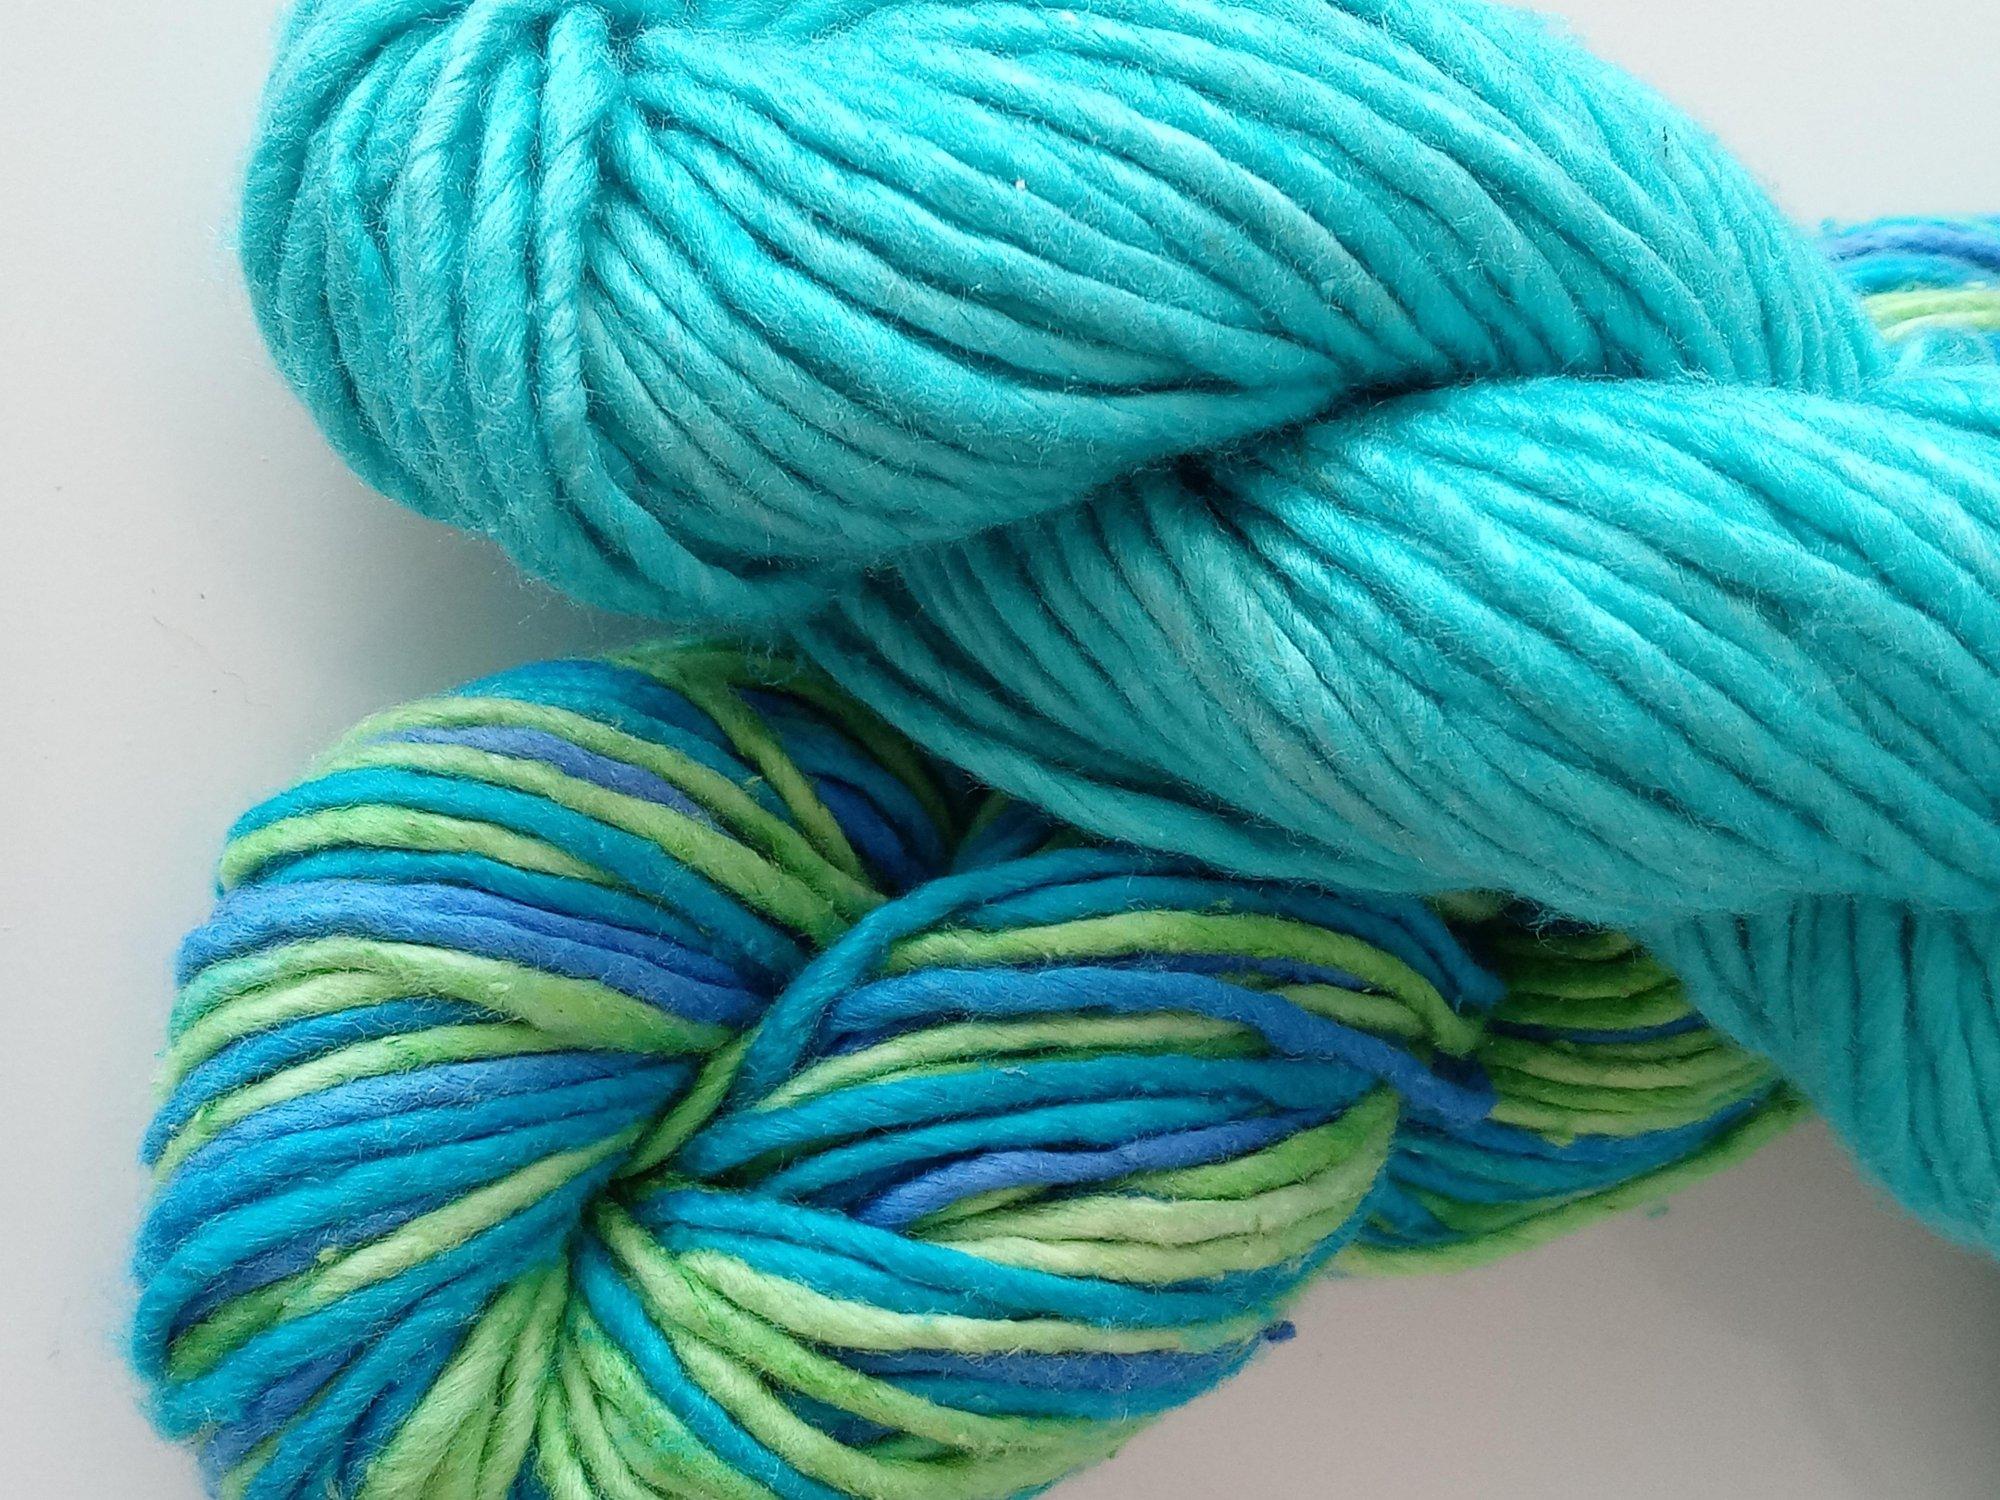 DGY Worsted silk yarn